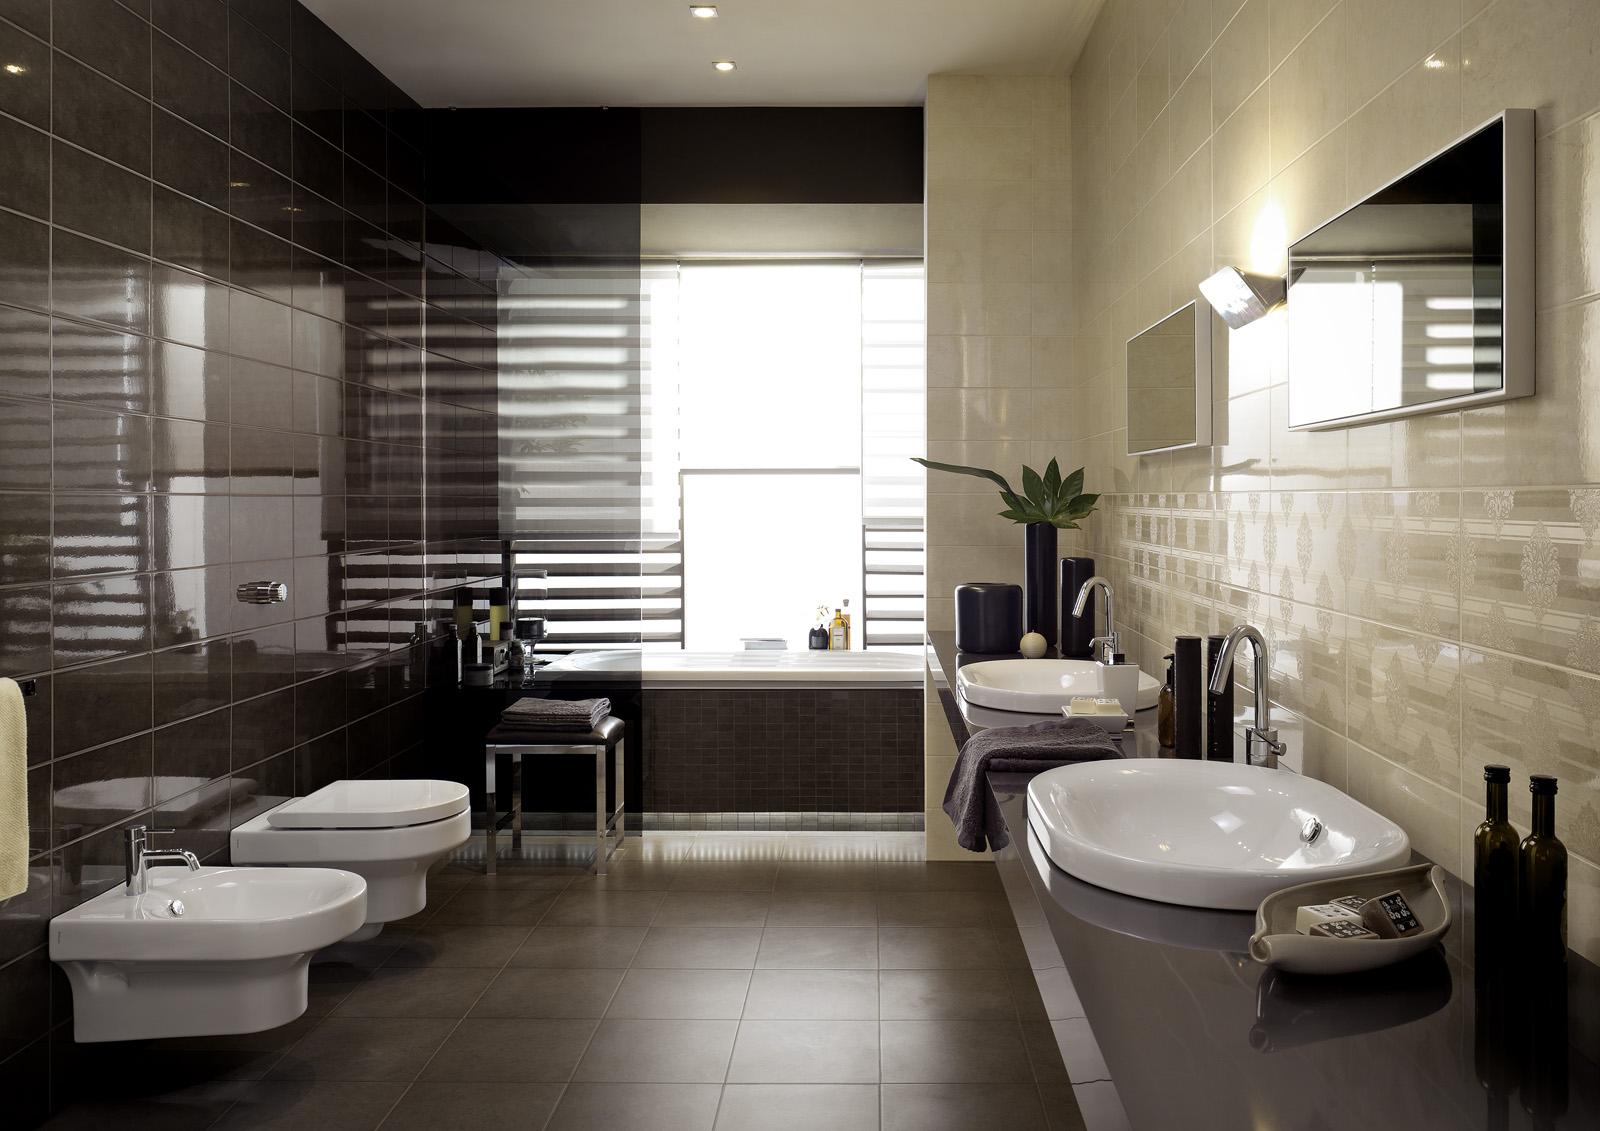 Suite - Ceramica lucida effetto marmo | Marazzi